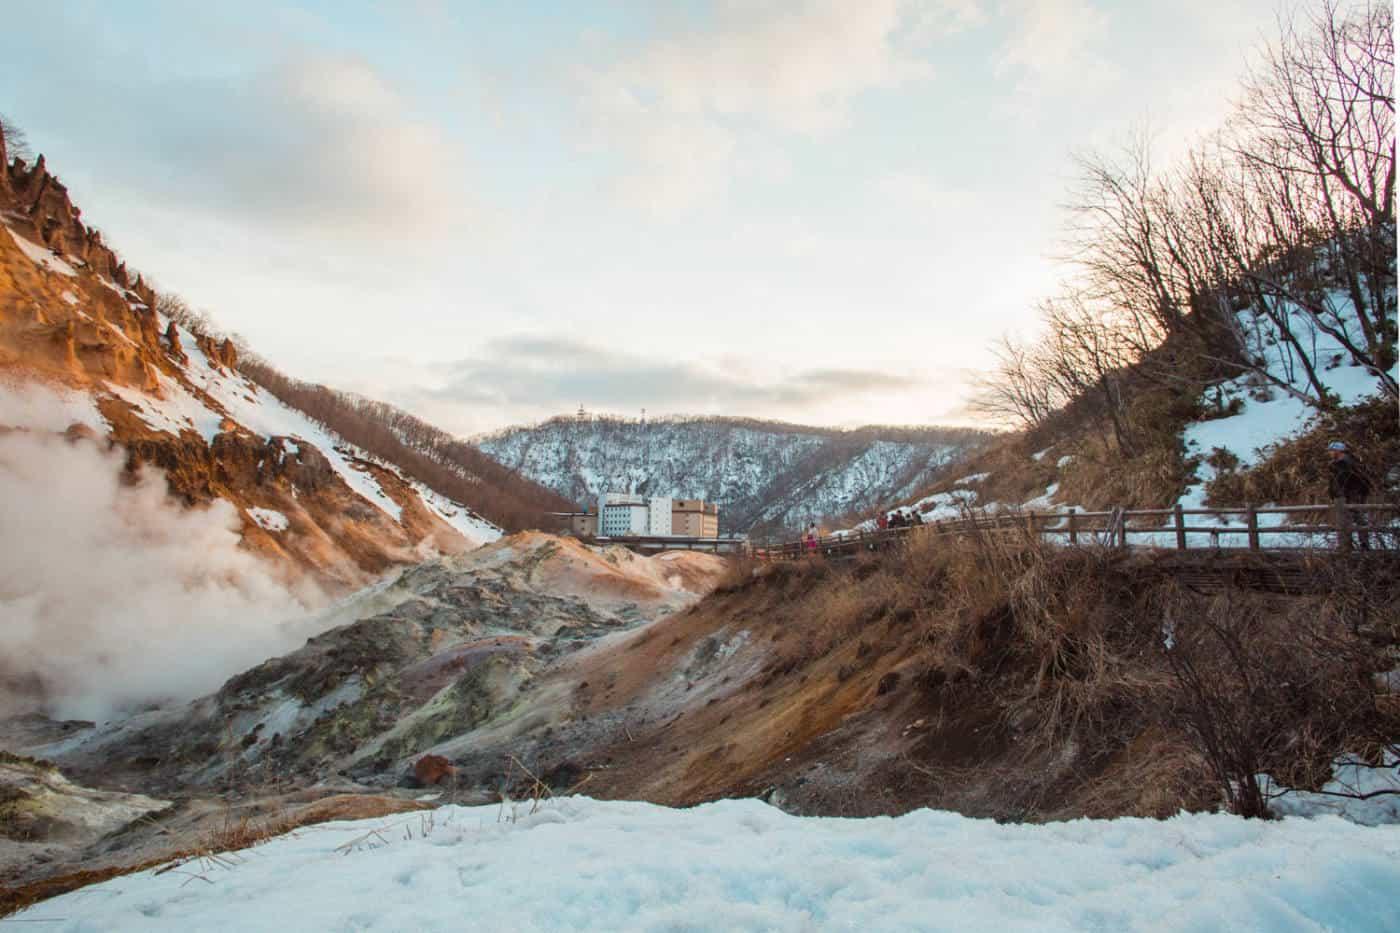 Planning a trip to Hokkaido Japan